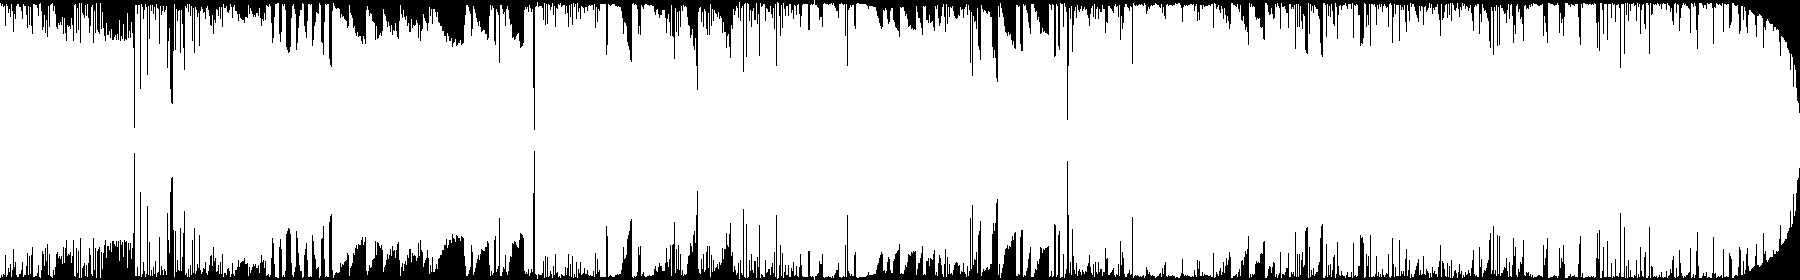 Laidback Acoustic audio waveform